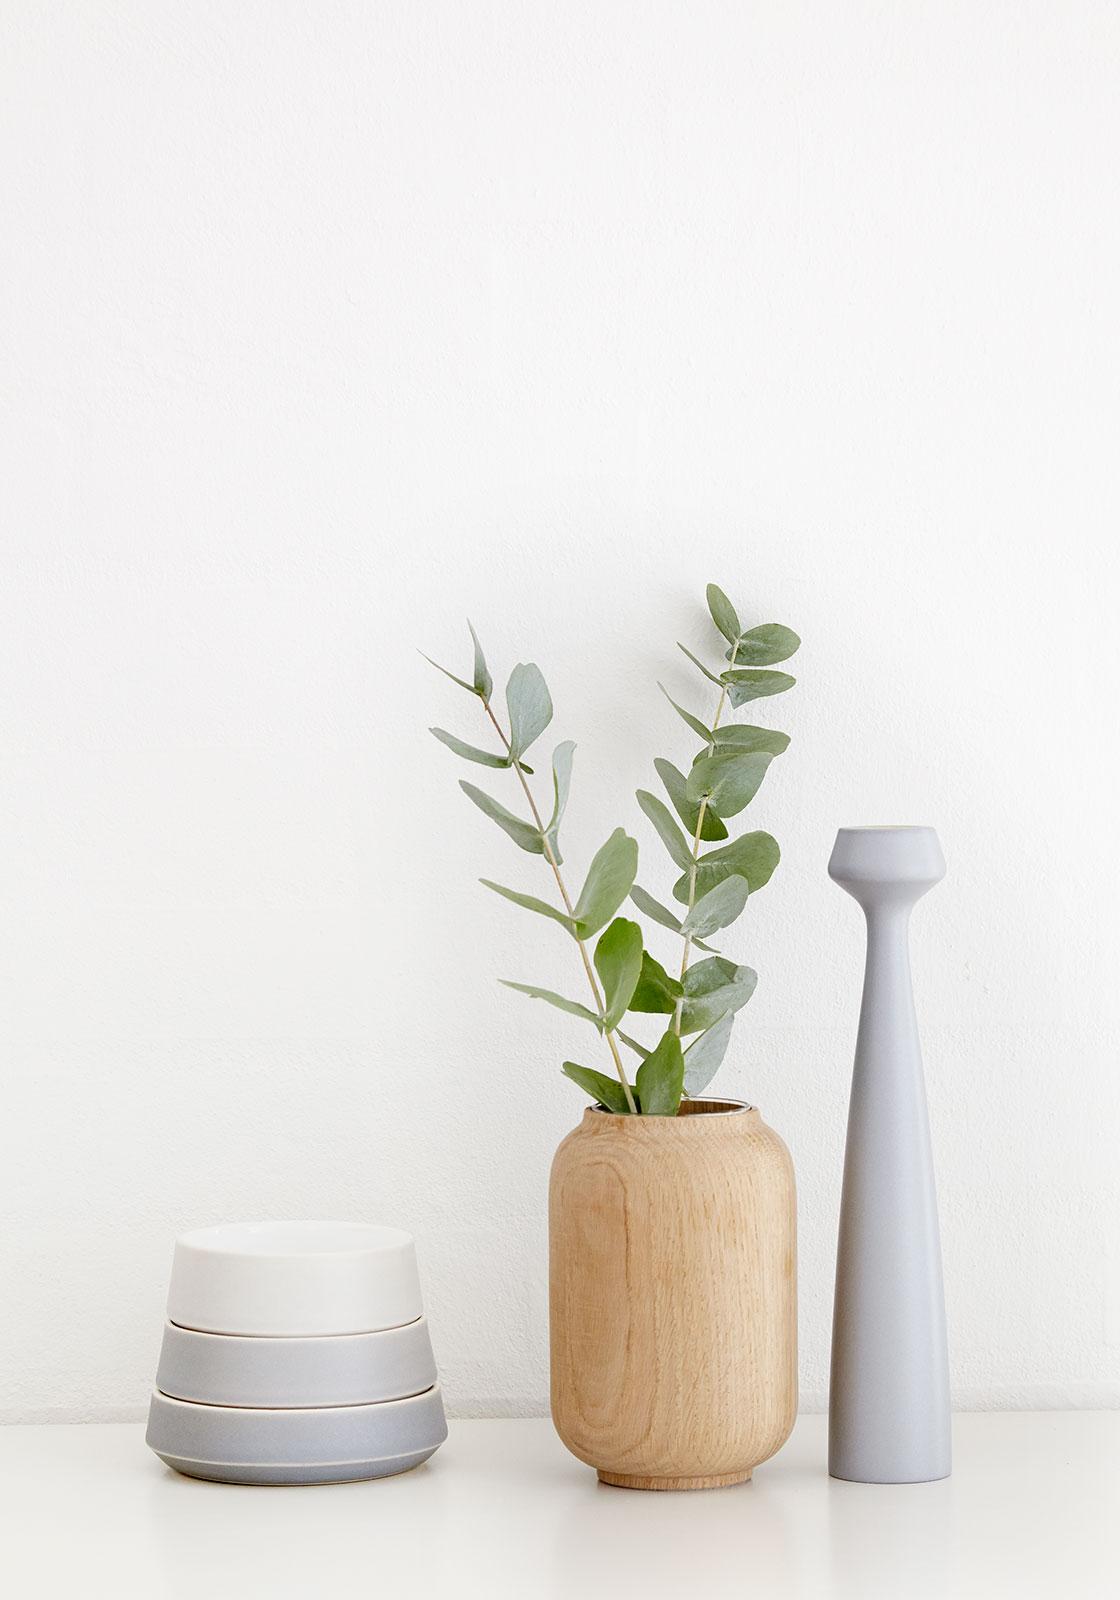 kerzenleuchter blossom rose ocean green von applicata. Black Bedroom Furniture Sets. Home Design Ideas